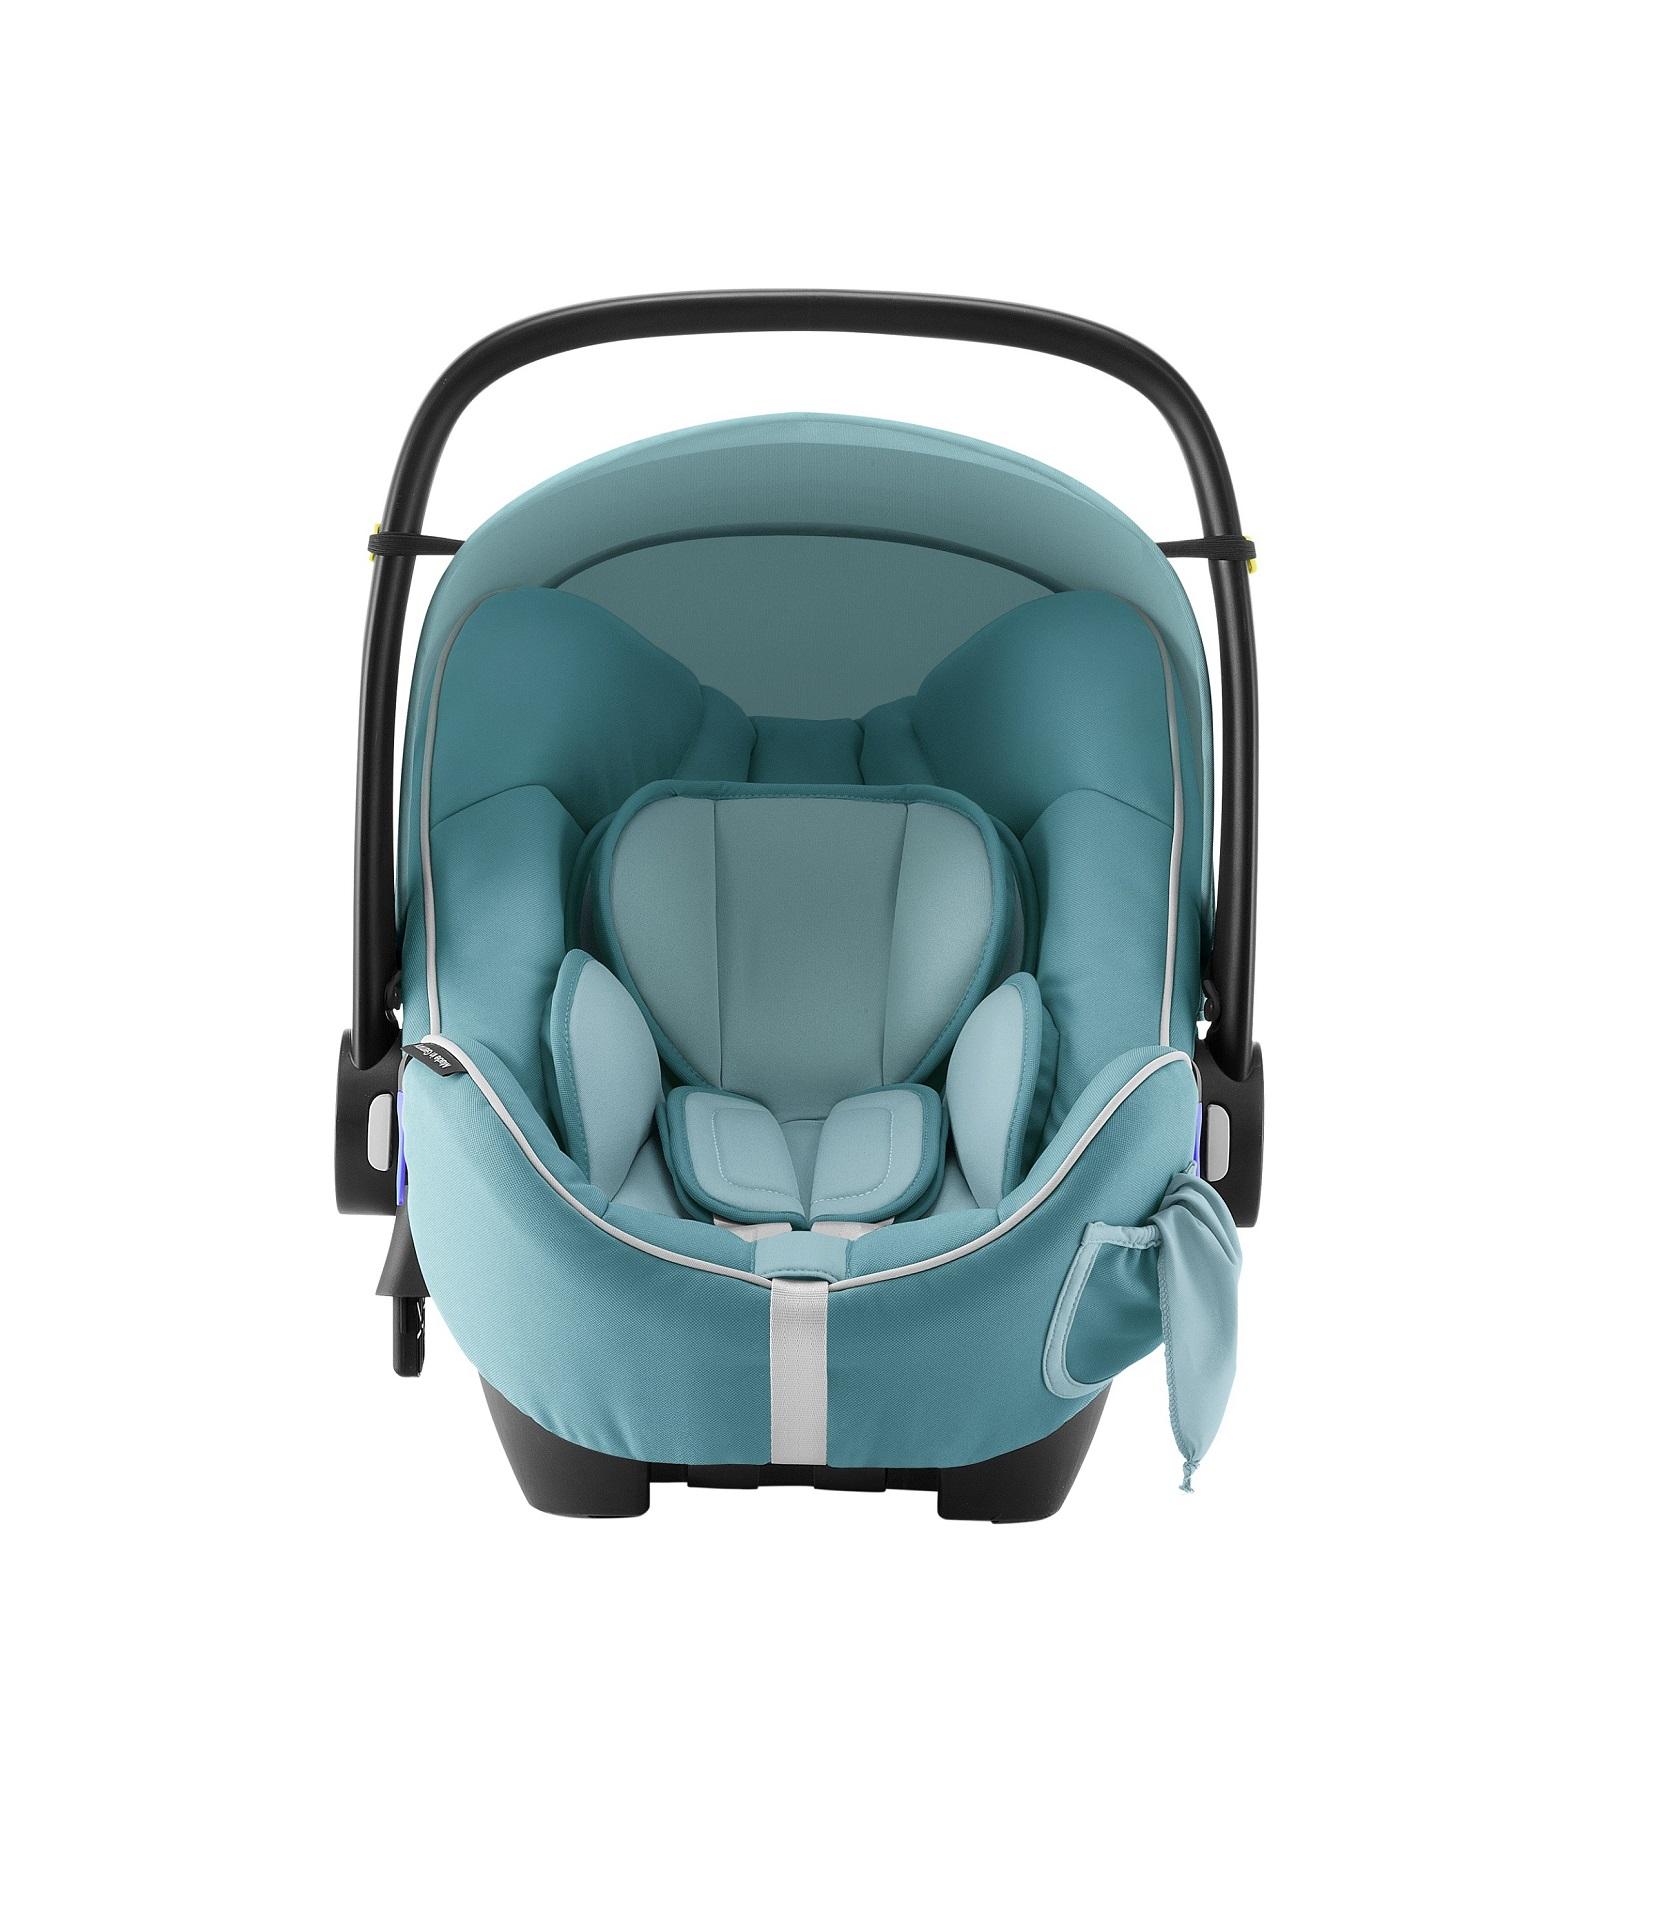 britax r mer infant car seat baby safe i size 2018 lagoon green buy at kidsroom car seats. Black Bedroom Furniture Sets. Home Design Ideas